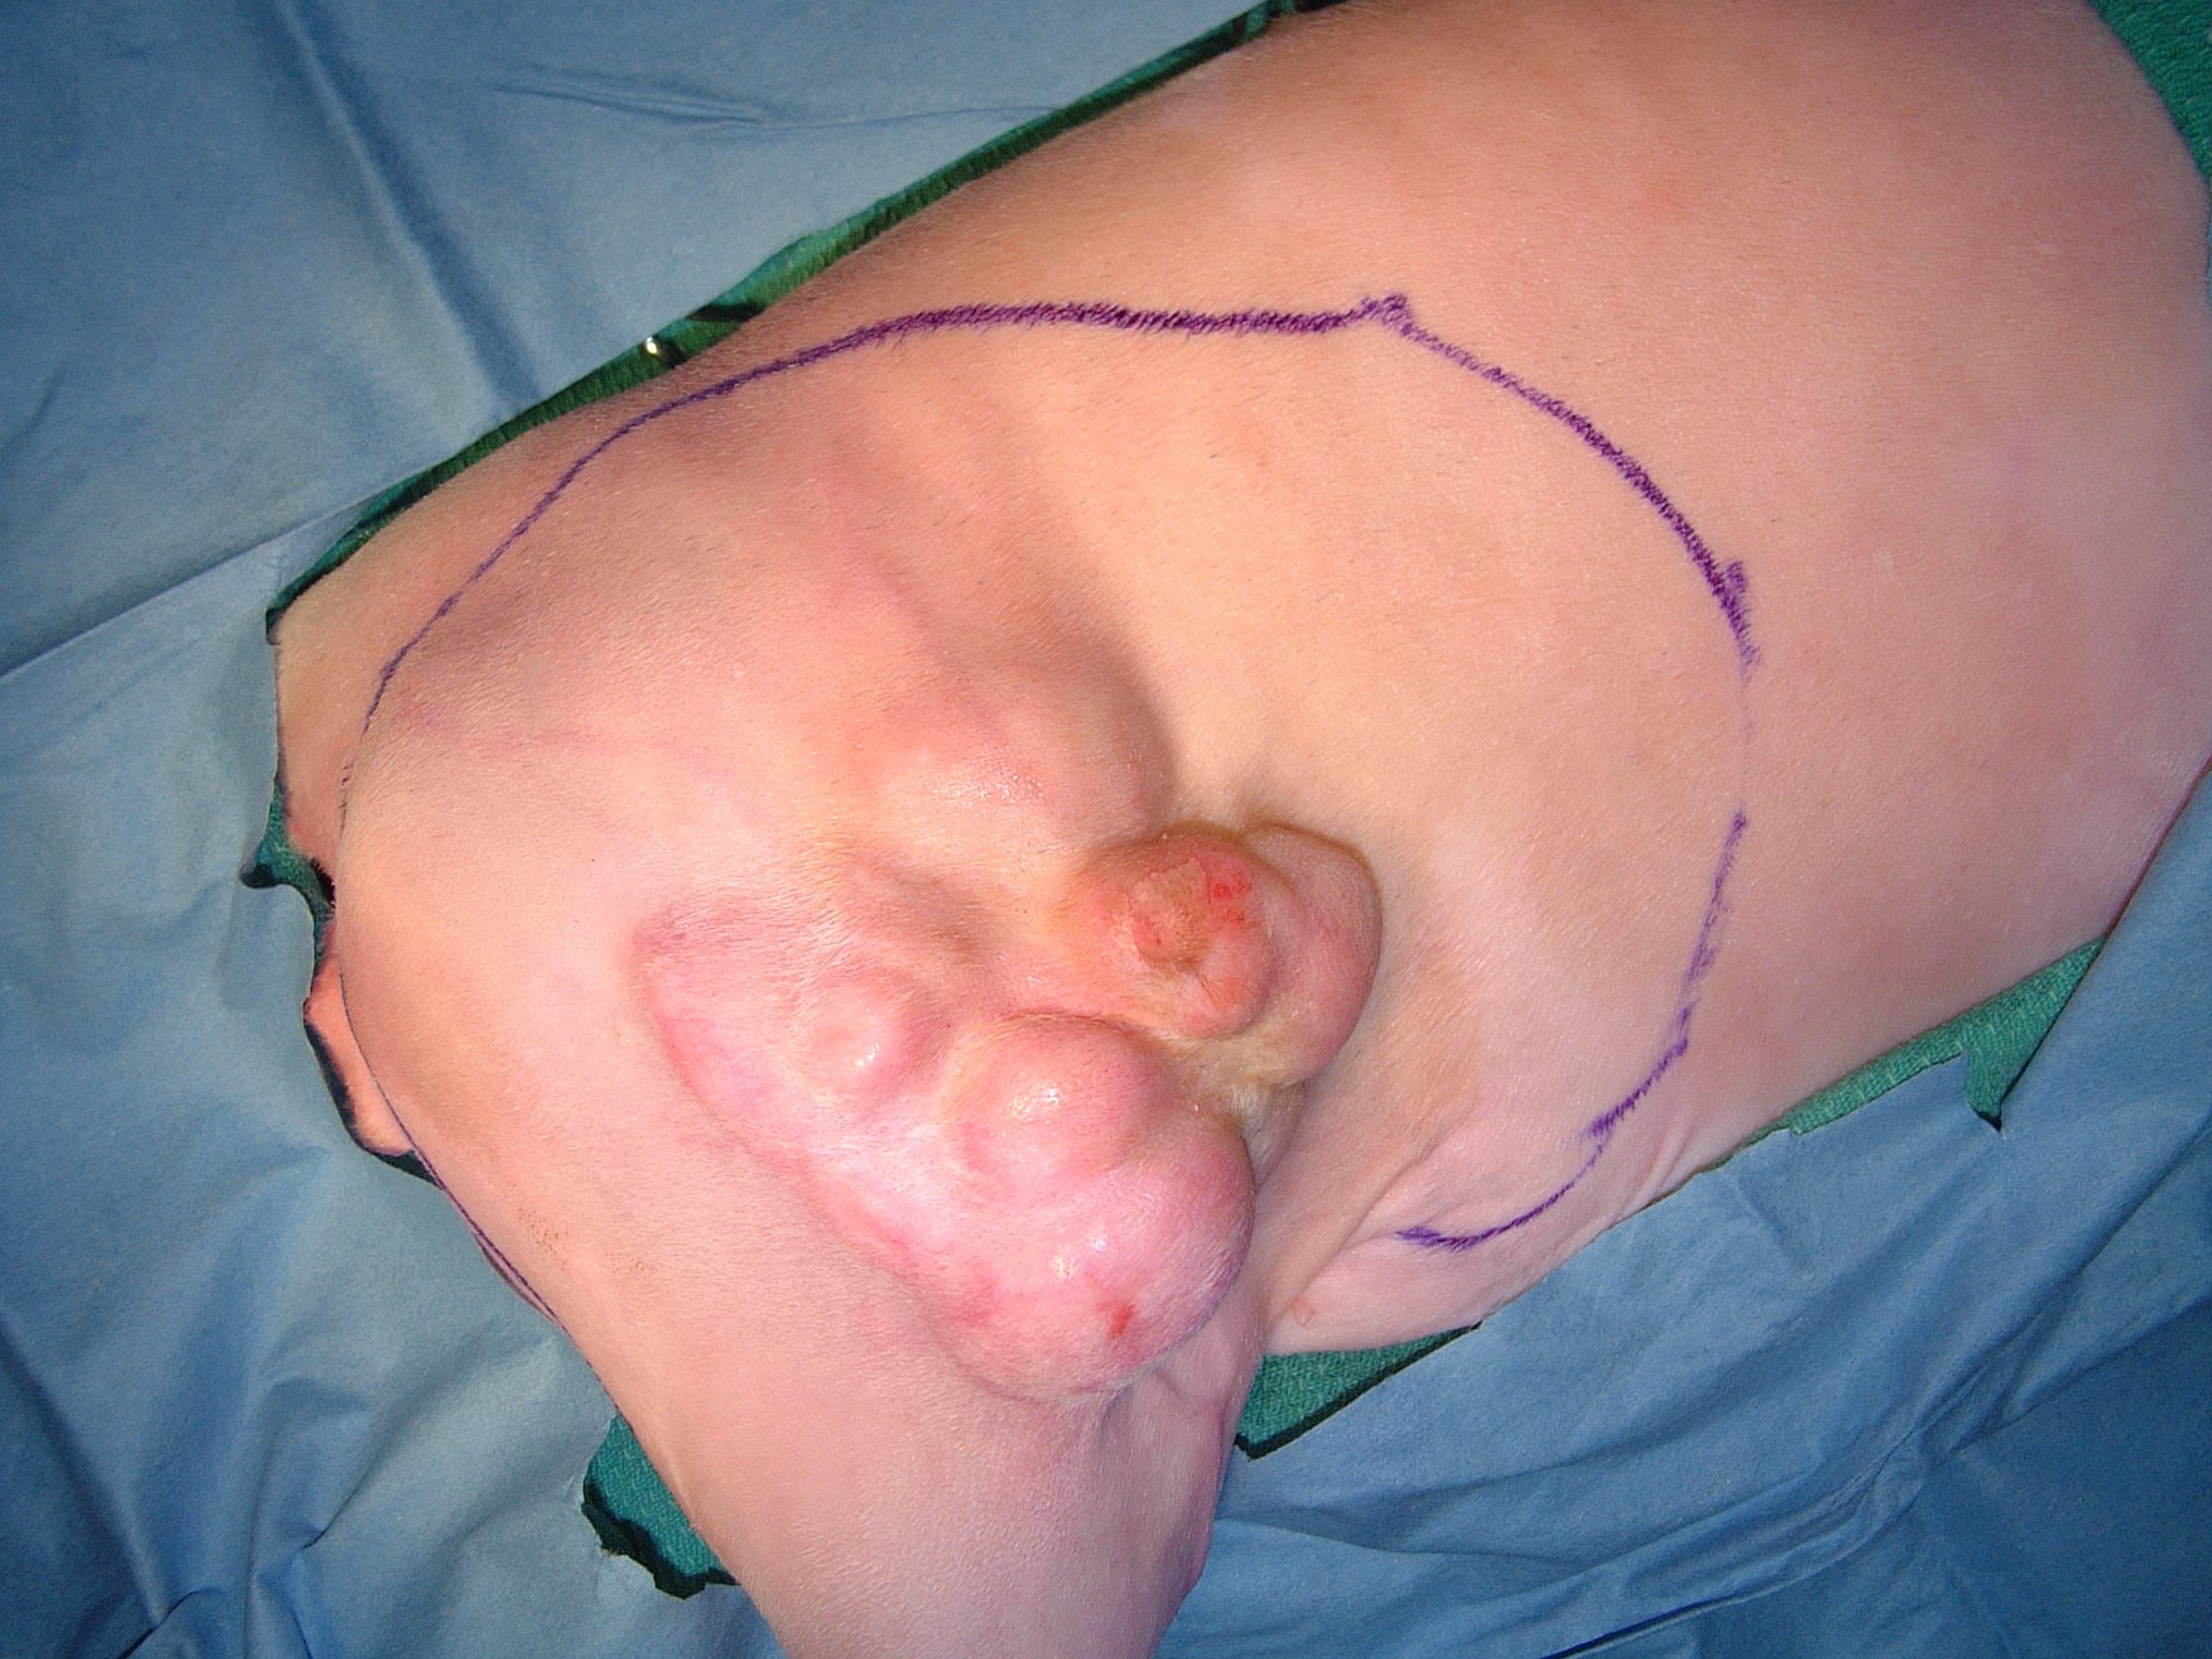 Pelvic limb ISS